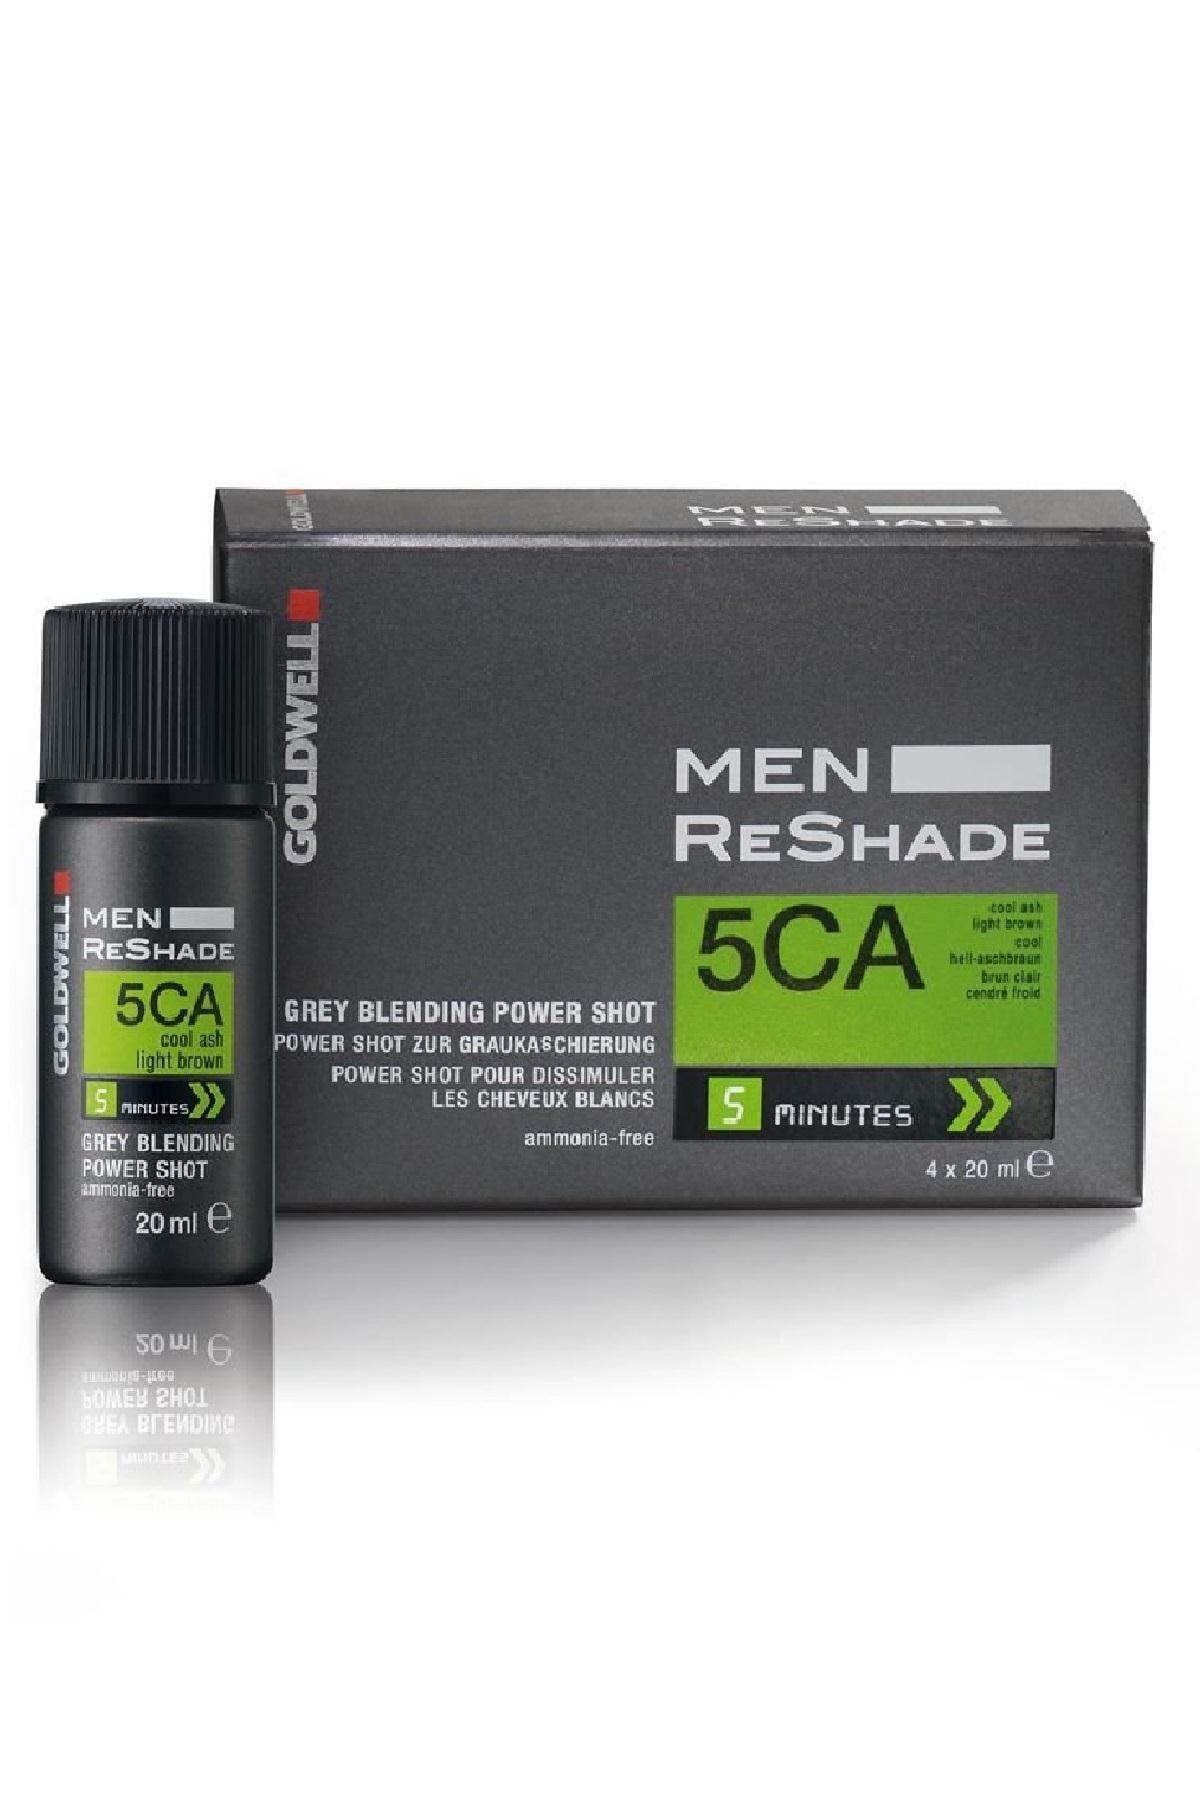 GOLDWELL Men Reshade 5ca Erkek Saç Boyası 4021609140061 1